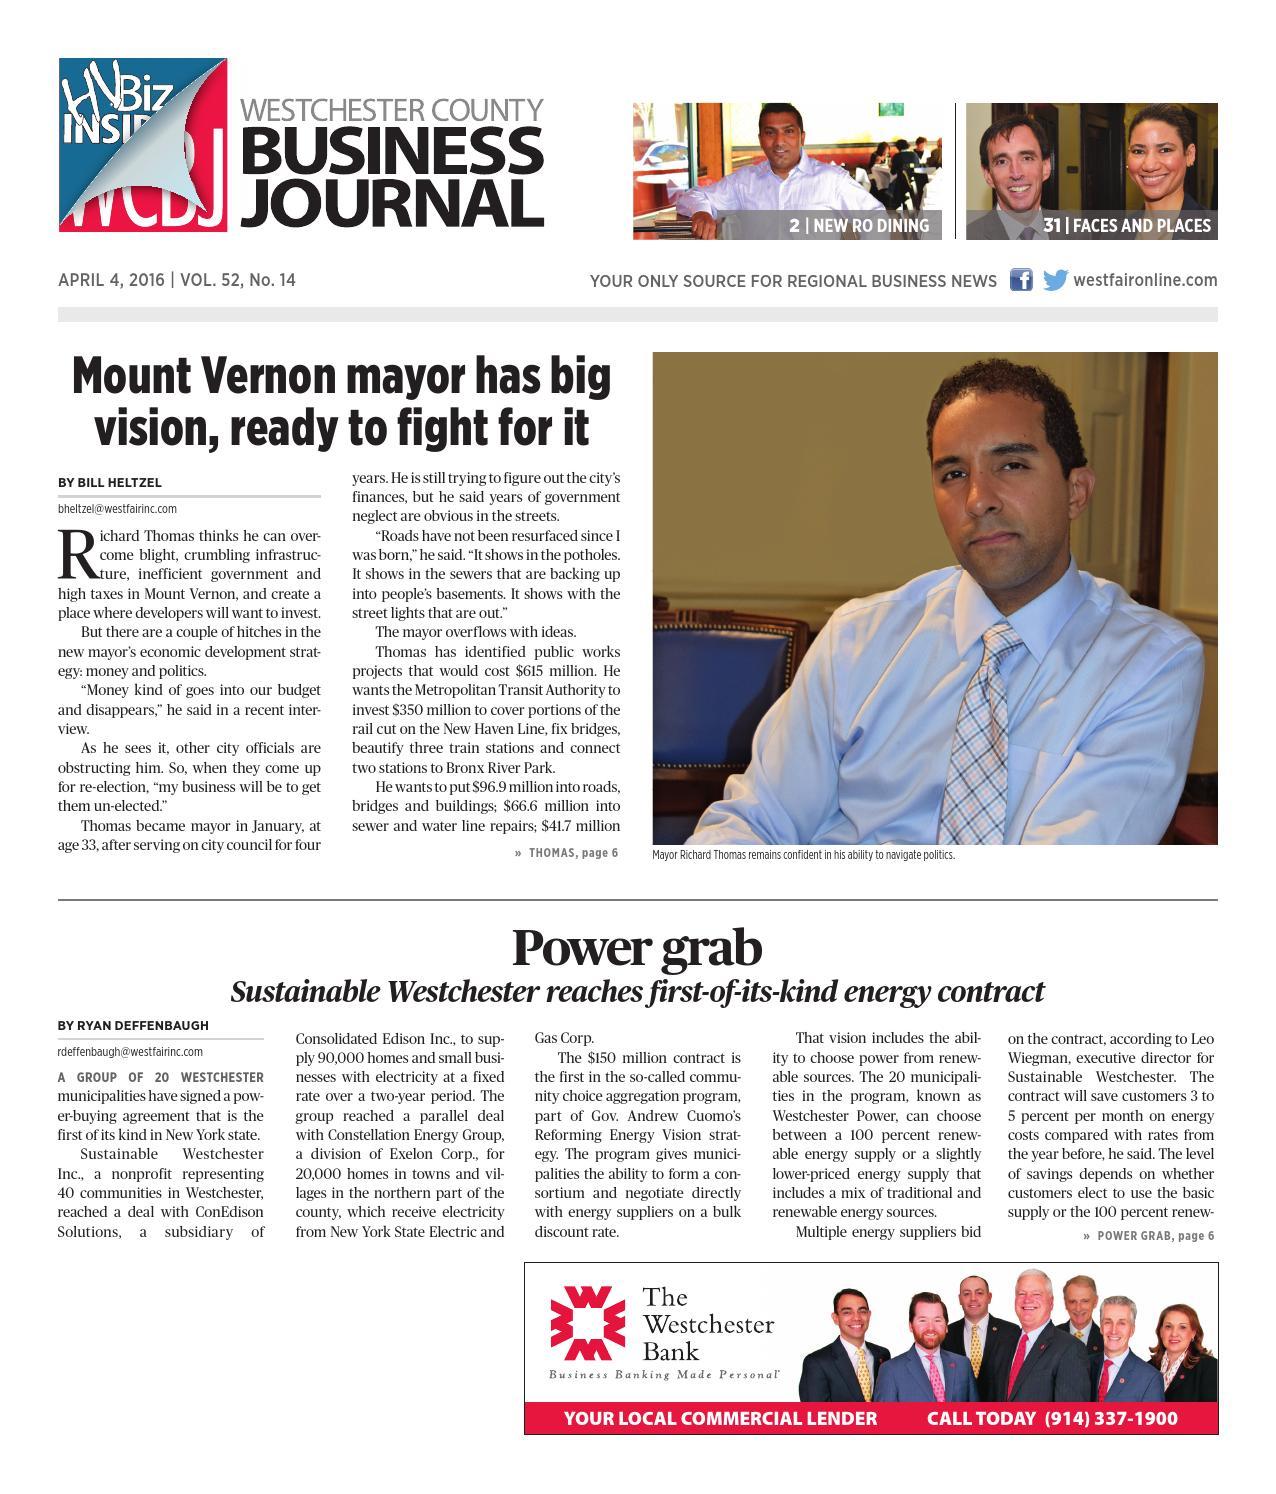 Westchester County Business Journal 040416 by Wag Magazine - issuu 0b4ac5cb9